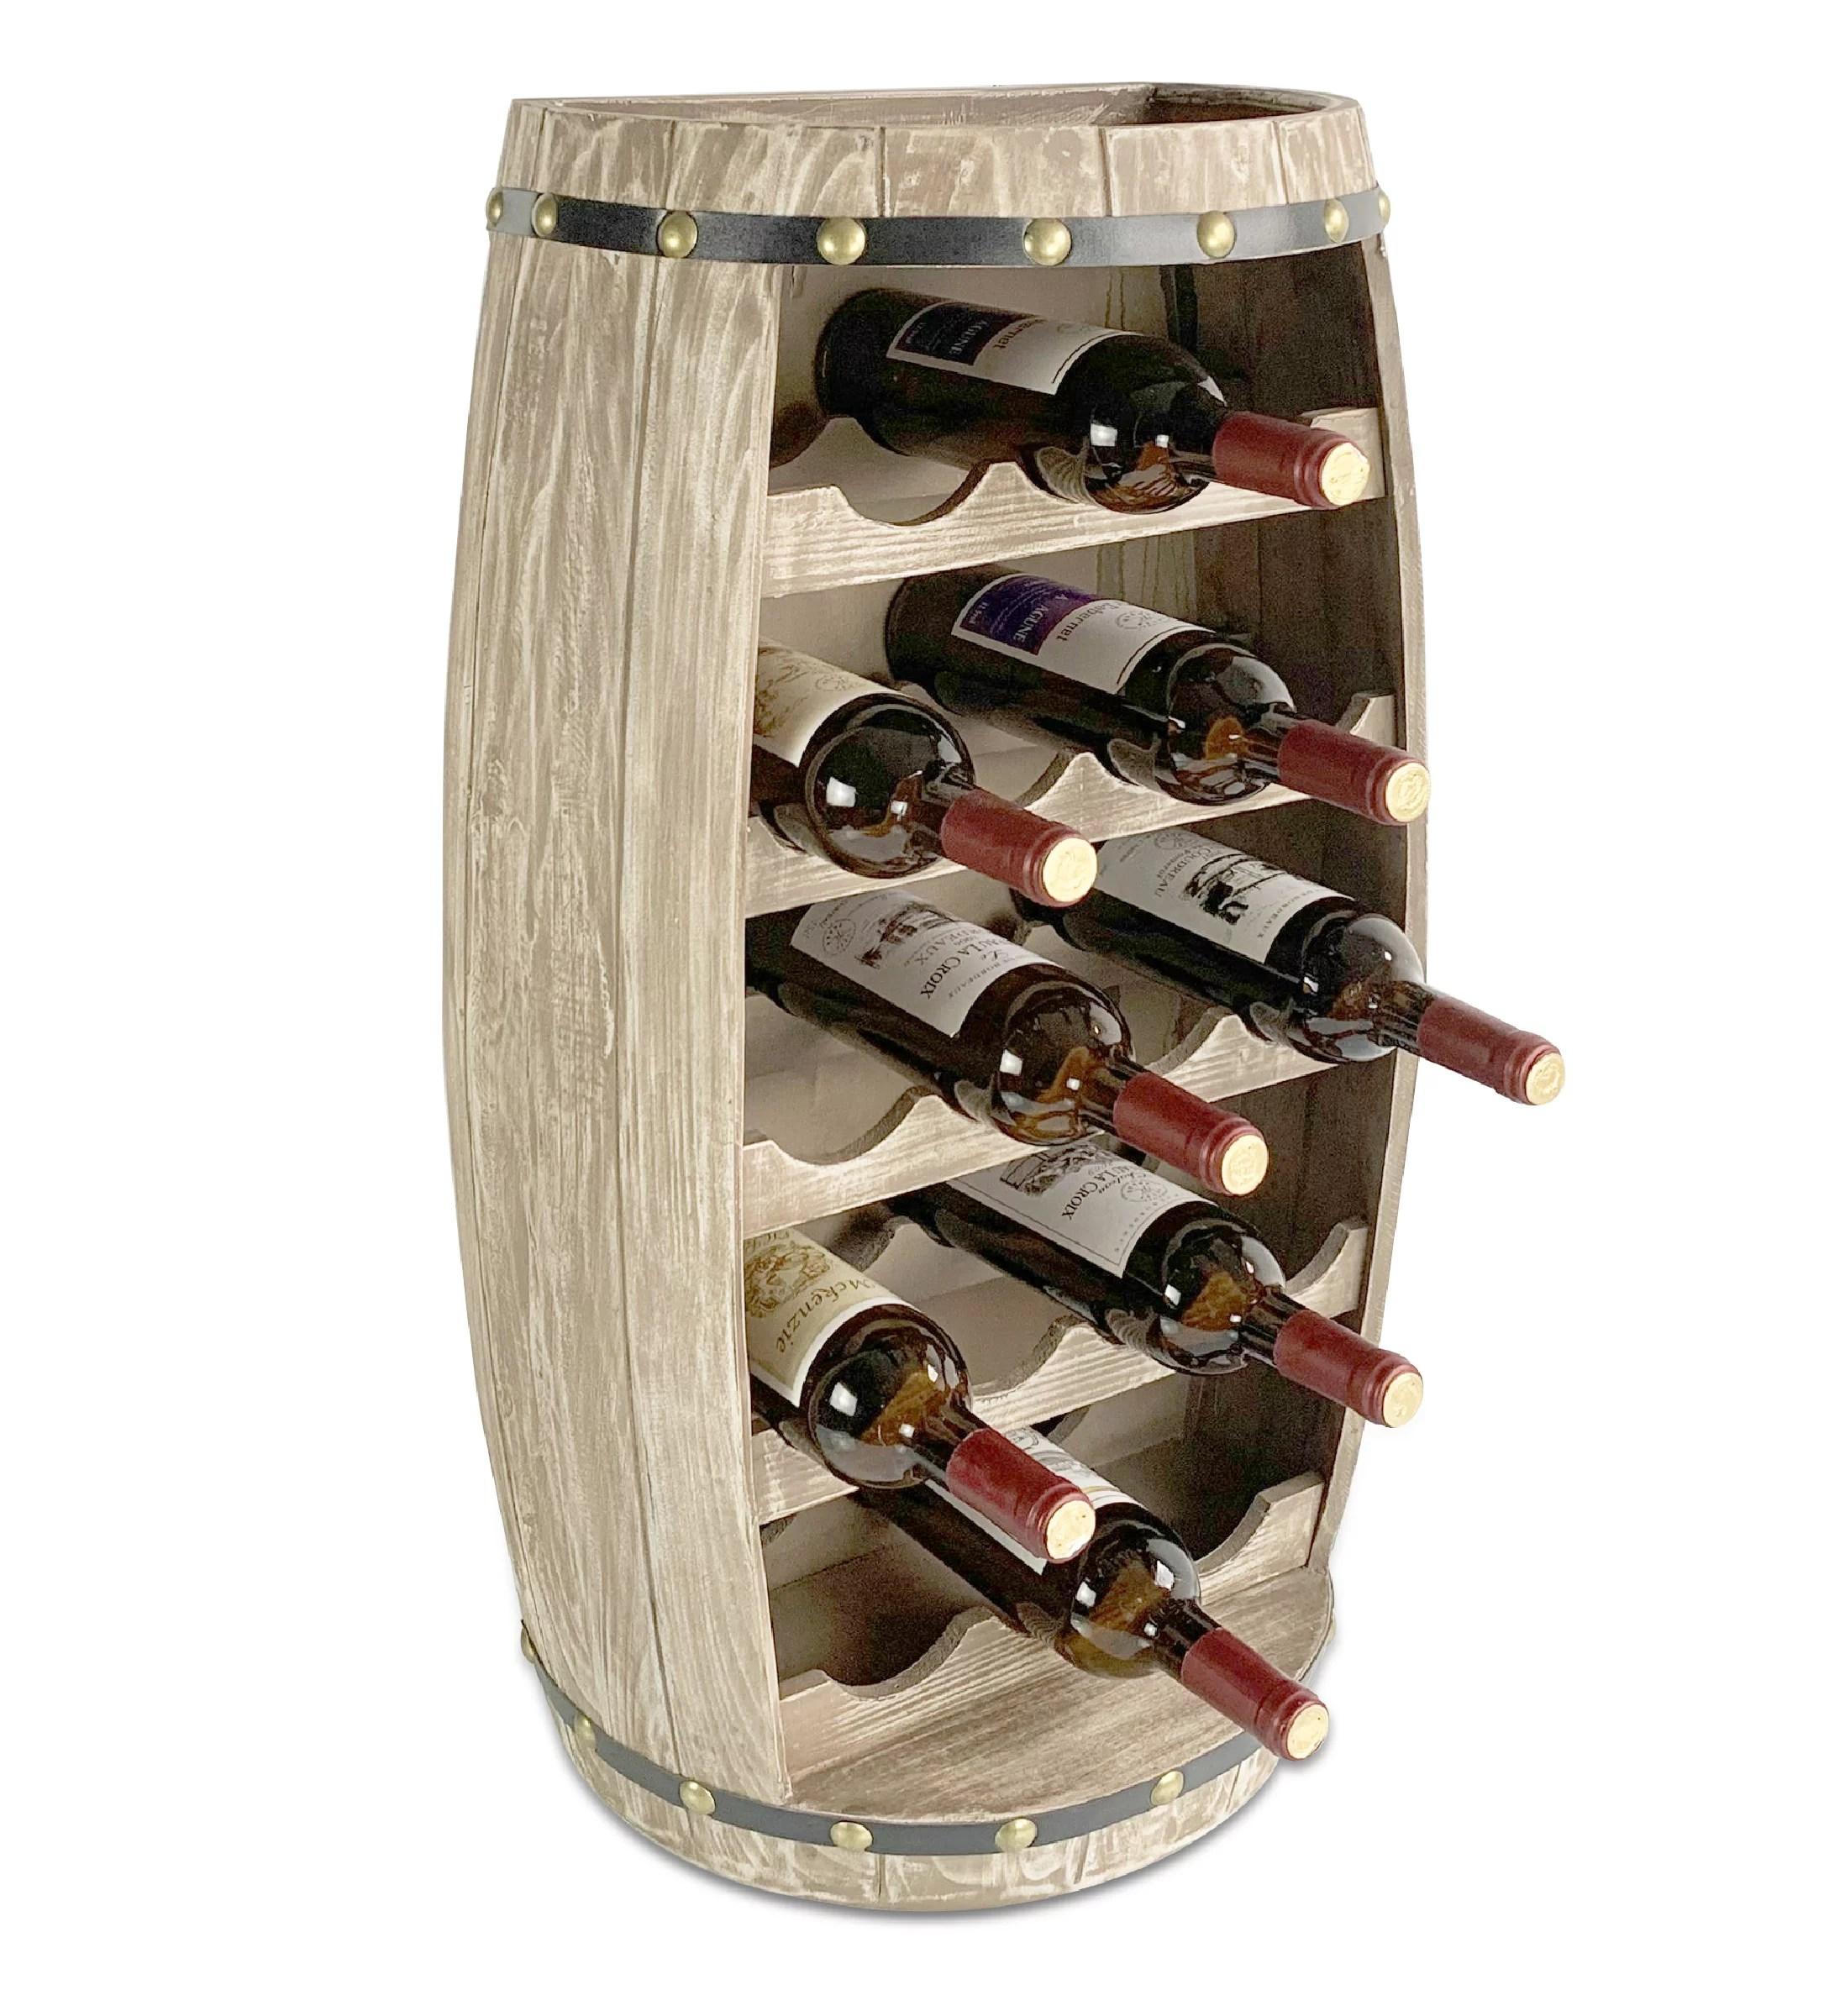 cota global modern alexander wall mounted wine rack 18 wine bottles freestanding wooden barrel wine holder hanging bottle rack or floor stand wine